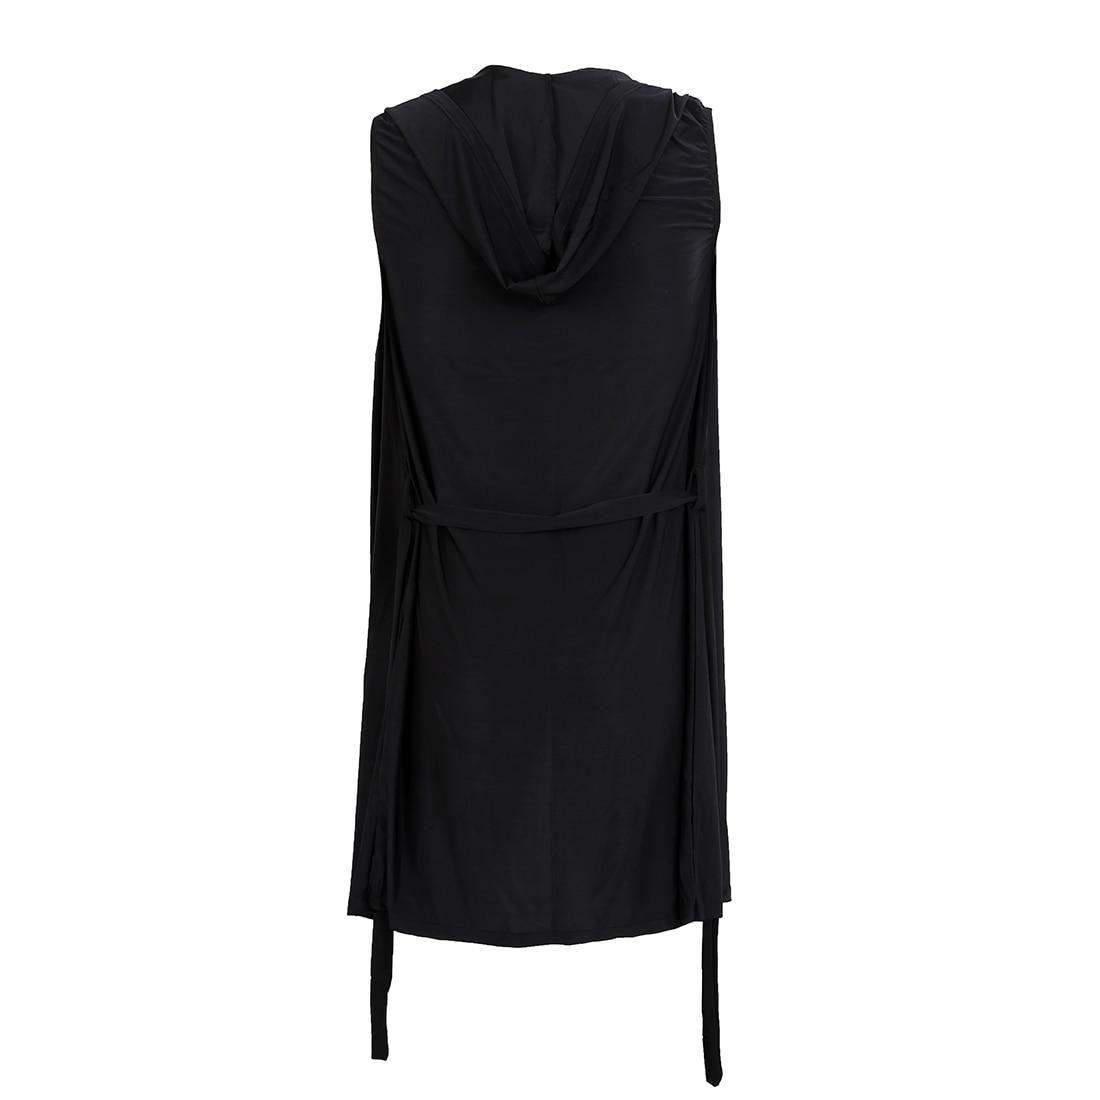 New Sexy Mens Robes Bathrobe Sleepwear Male Kimono Silk Black S